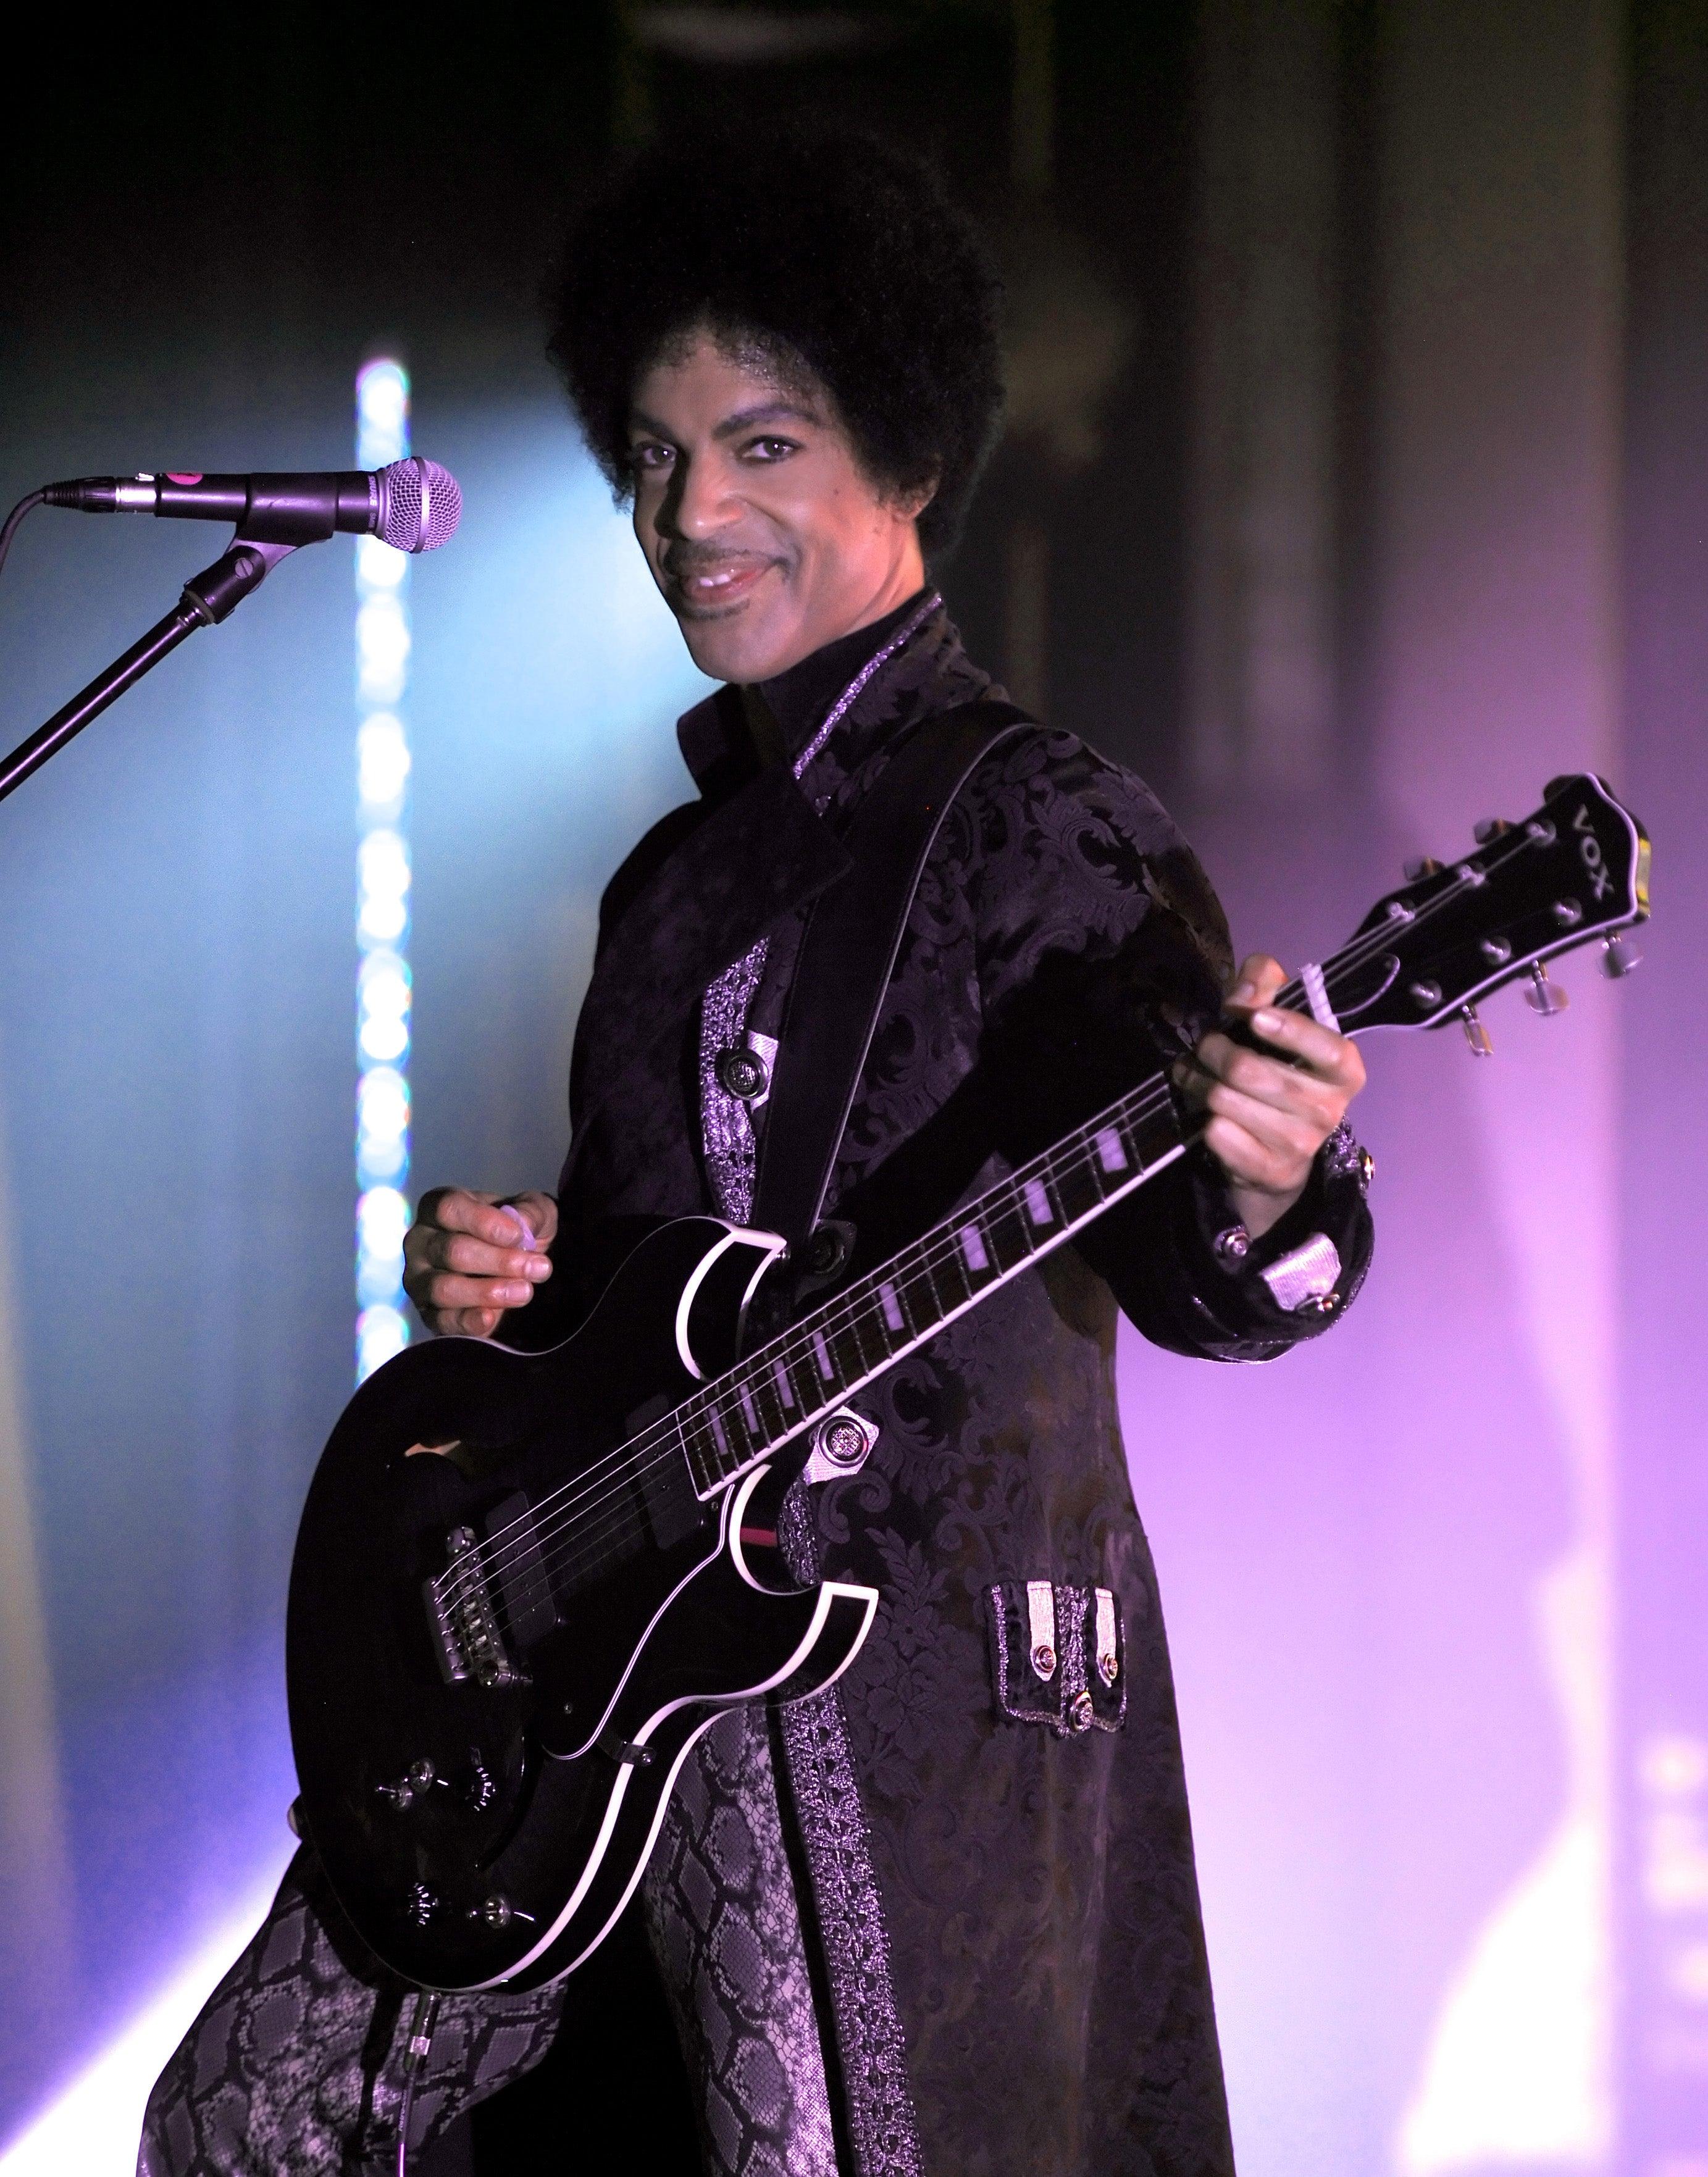 Prince Vault Of Unreleased Music Has Reportedly Been Open